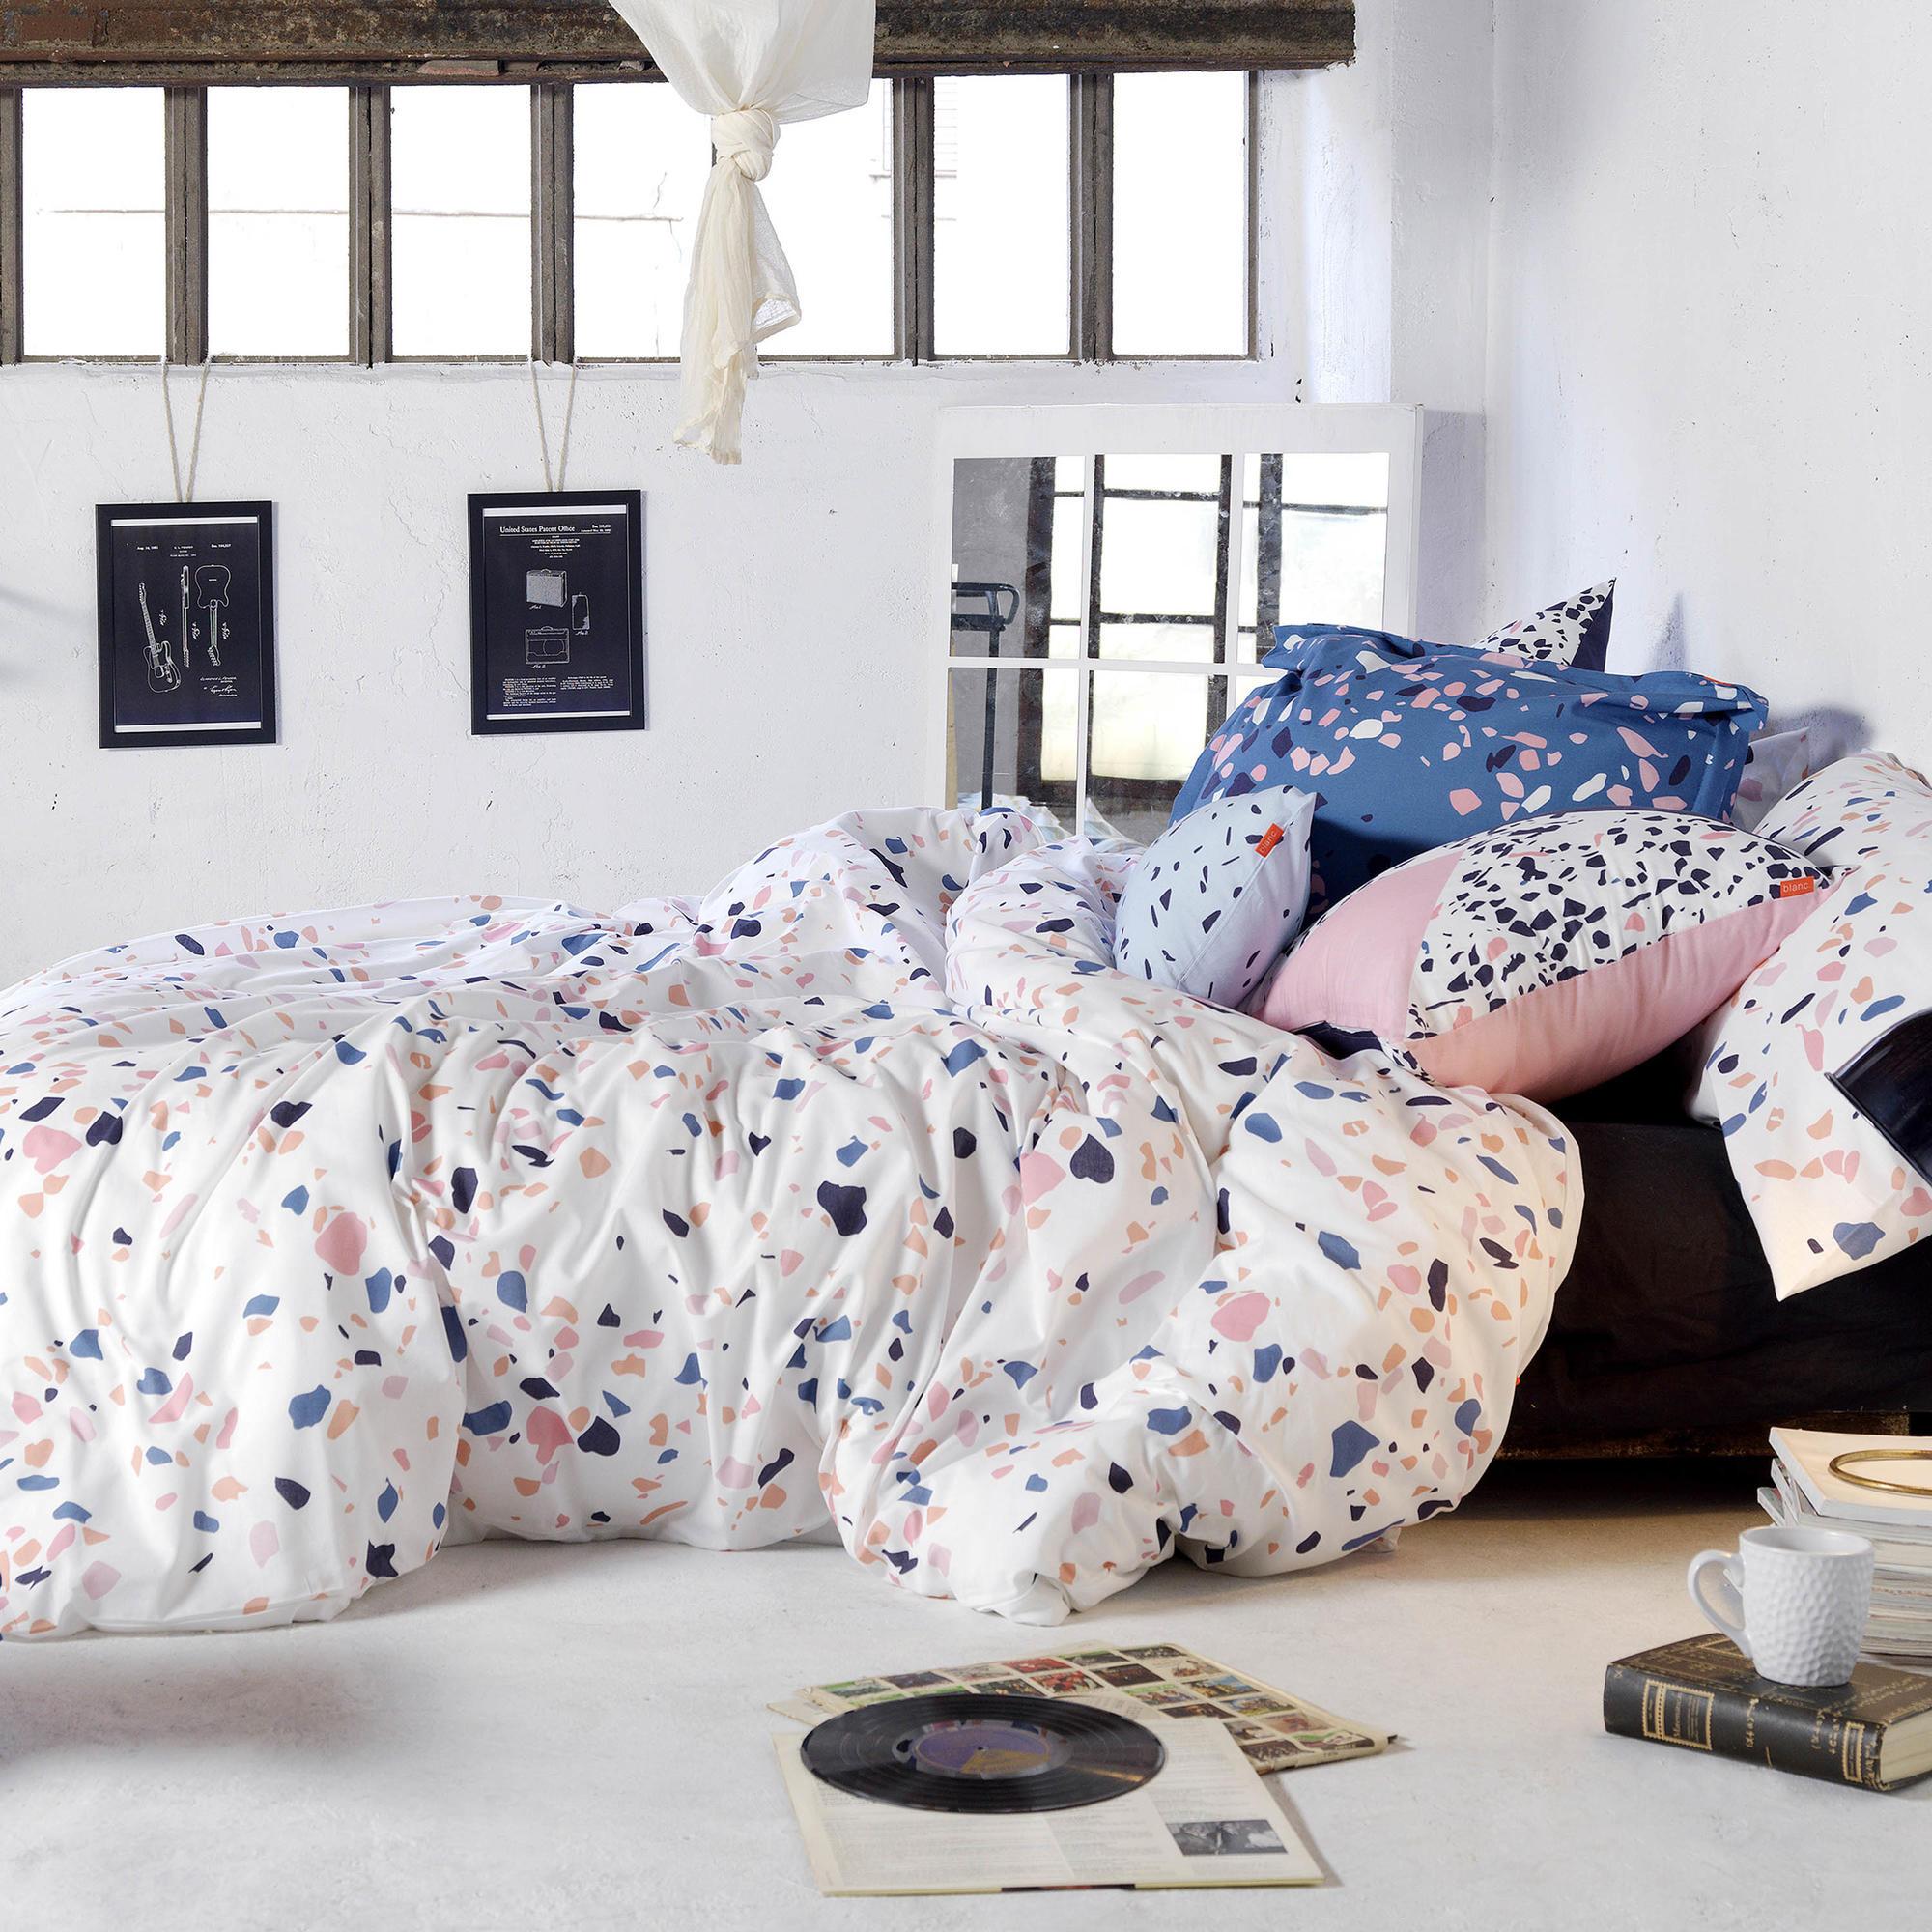 Bettüberzug | Terrazzo-140 x 200 cm